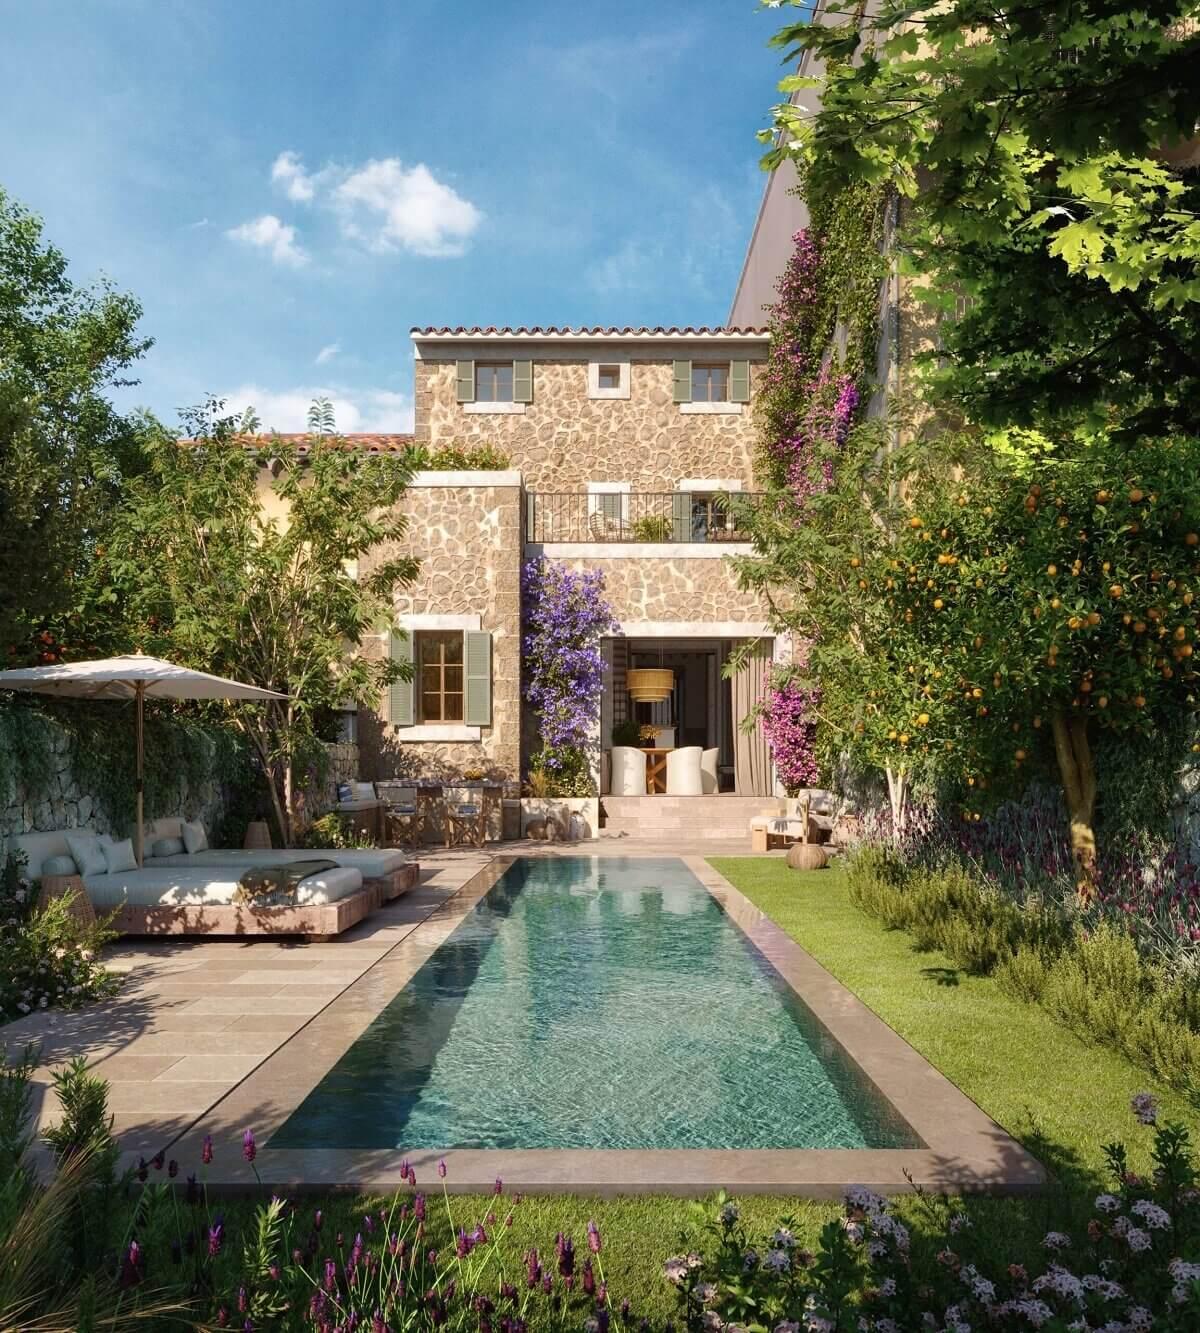 Casa Marés: A Parisian Influenced Townhouse on Mallorca